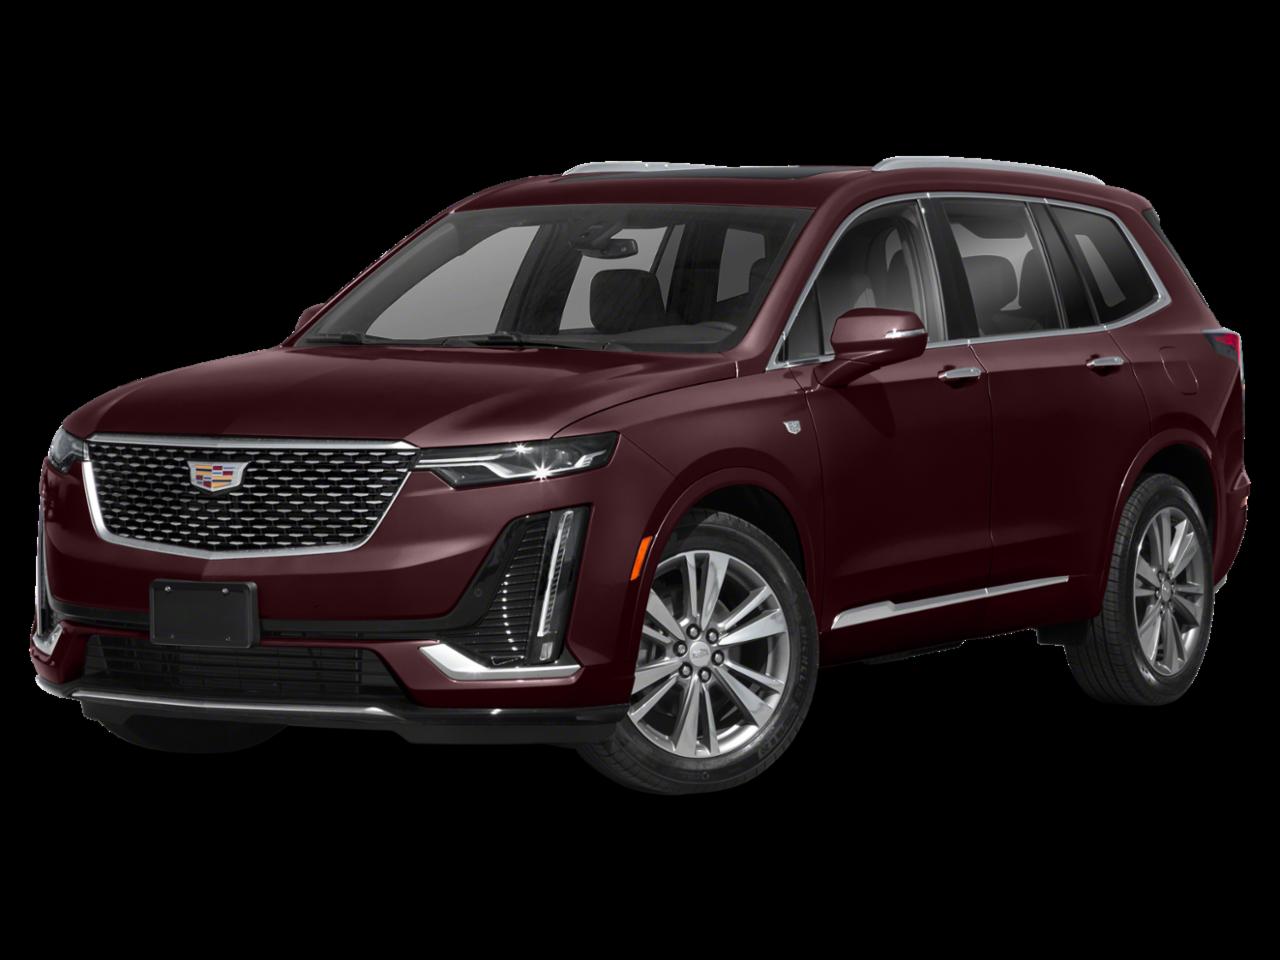 Cadillac 2021 XT6 Premium Luxury